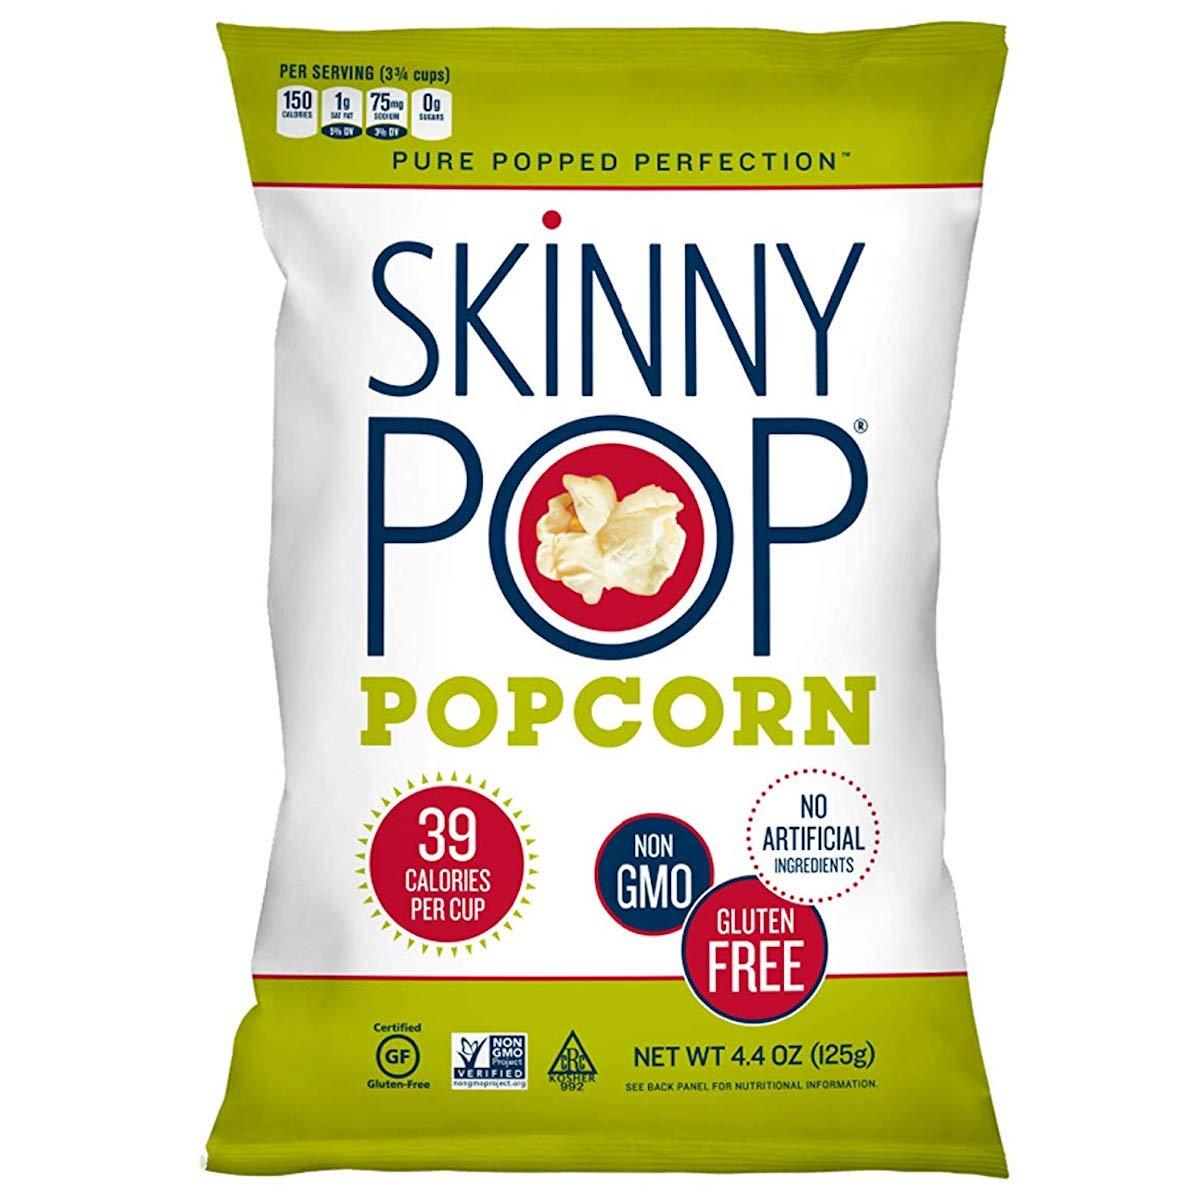 SkinnyPop Trust Orignal Popcorn 4.4oz Grocery Pop Bags Ranking integrated 1st place Skinny Size